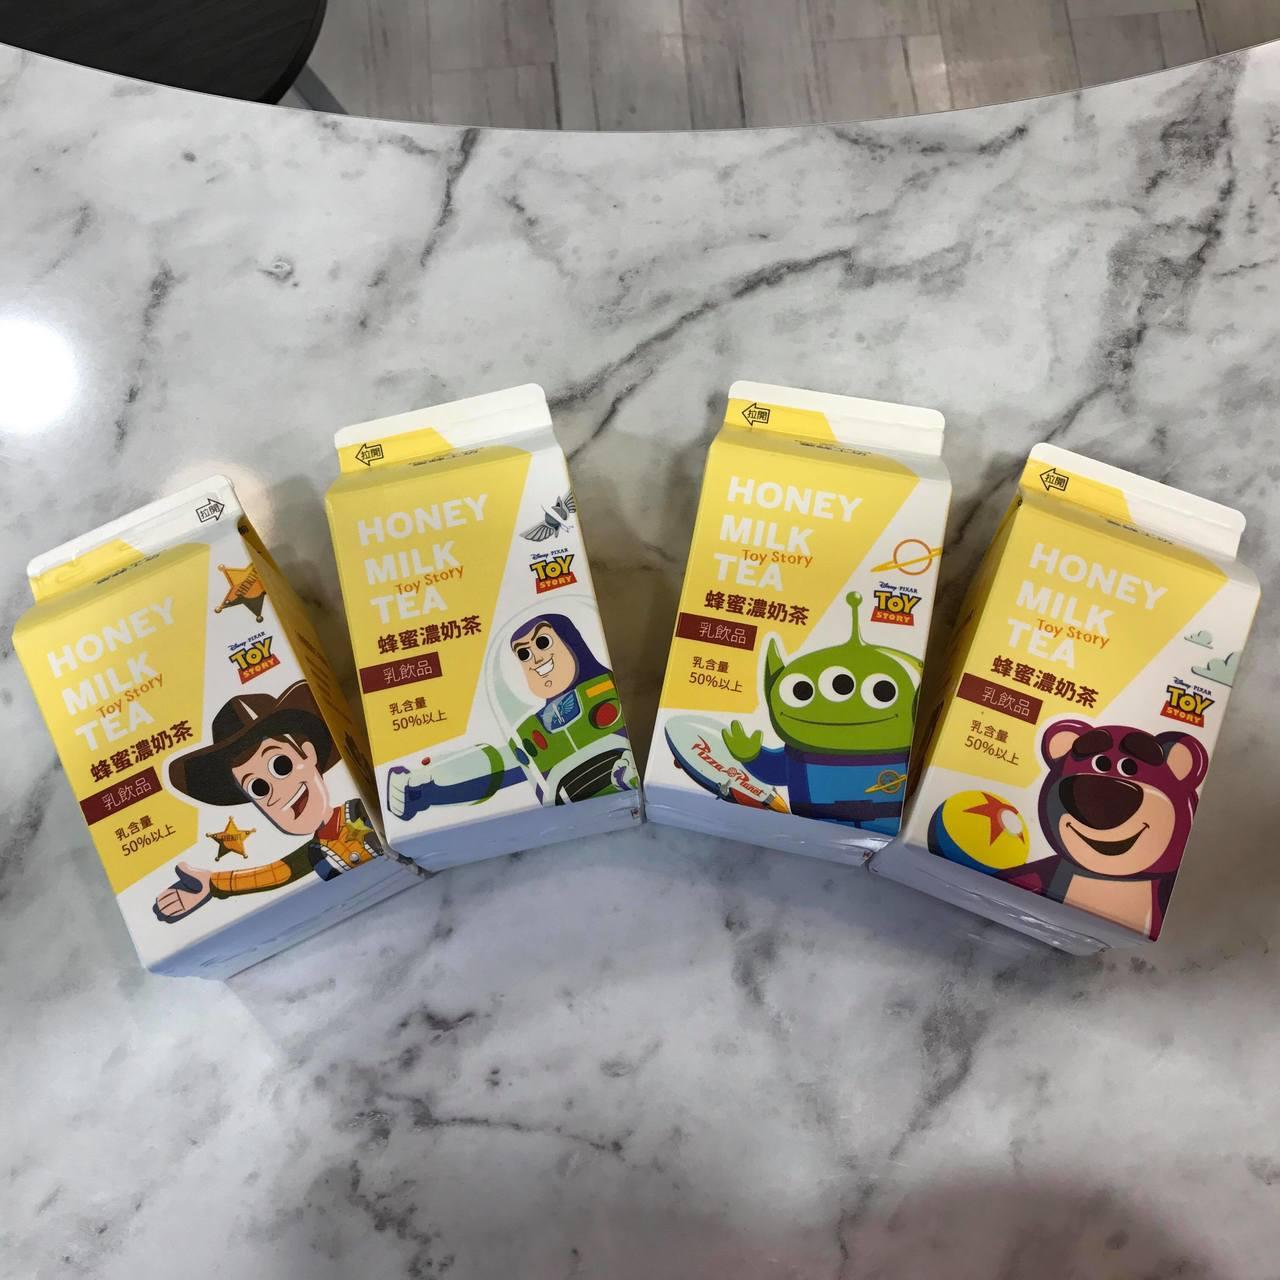 7-ELEVEN於6月17日起推出4款玩具總動員「蜜蜂工坊-蜂蜜濃奶茶」。記者陳...